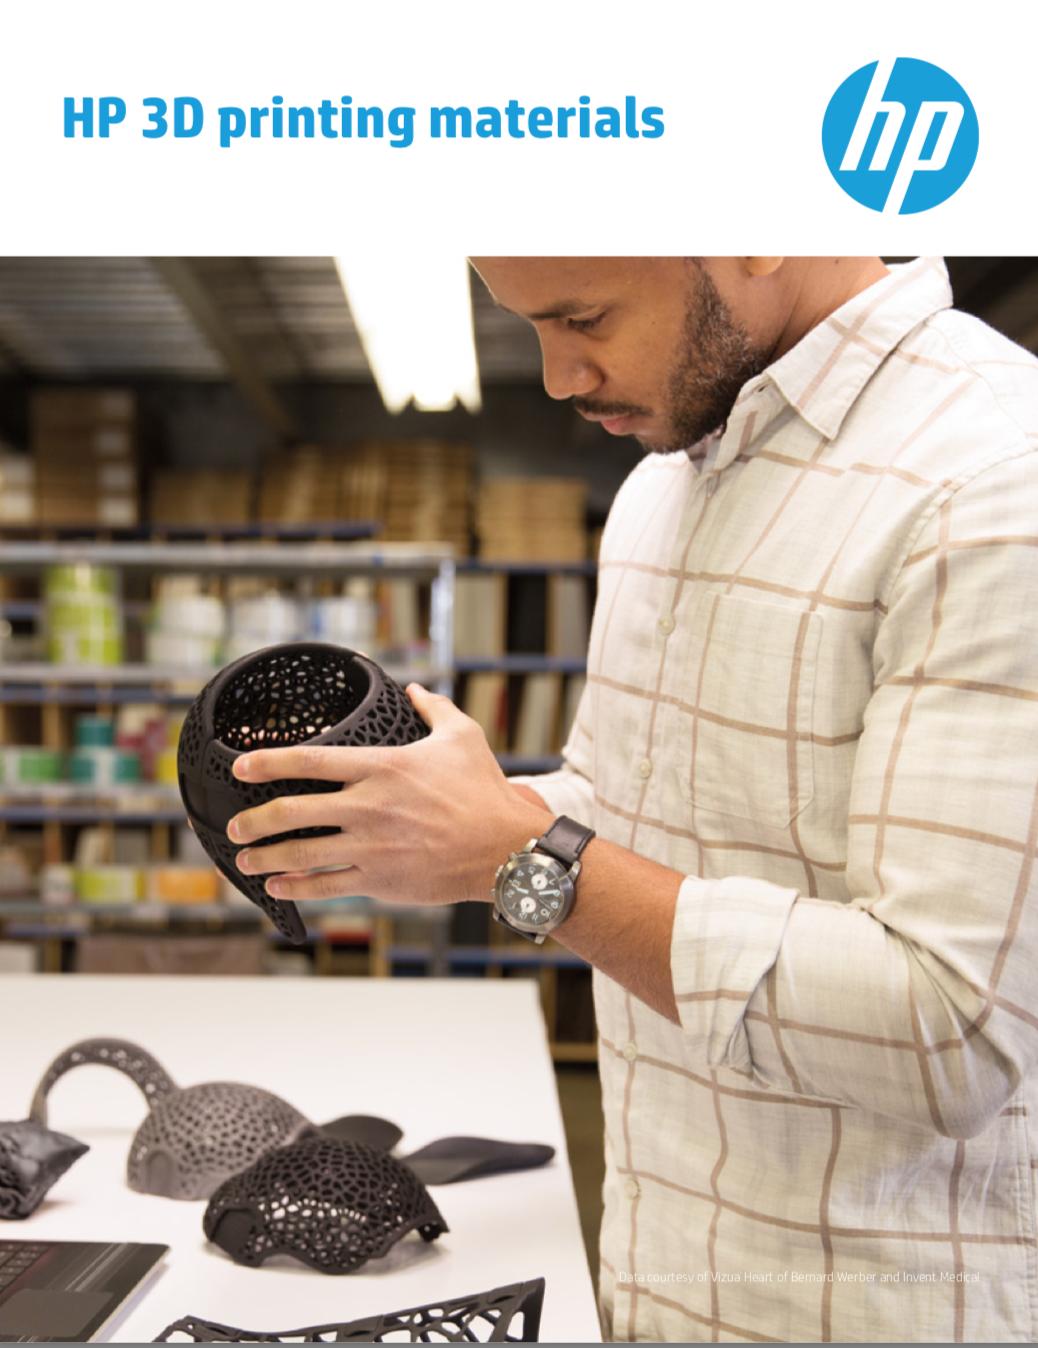 HP Broschüre Open Plattform 3D Printing Materials